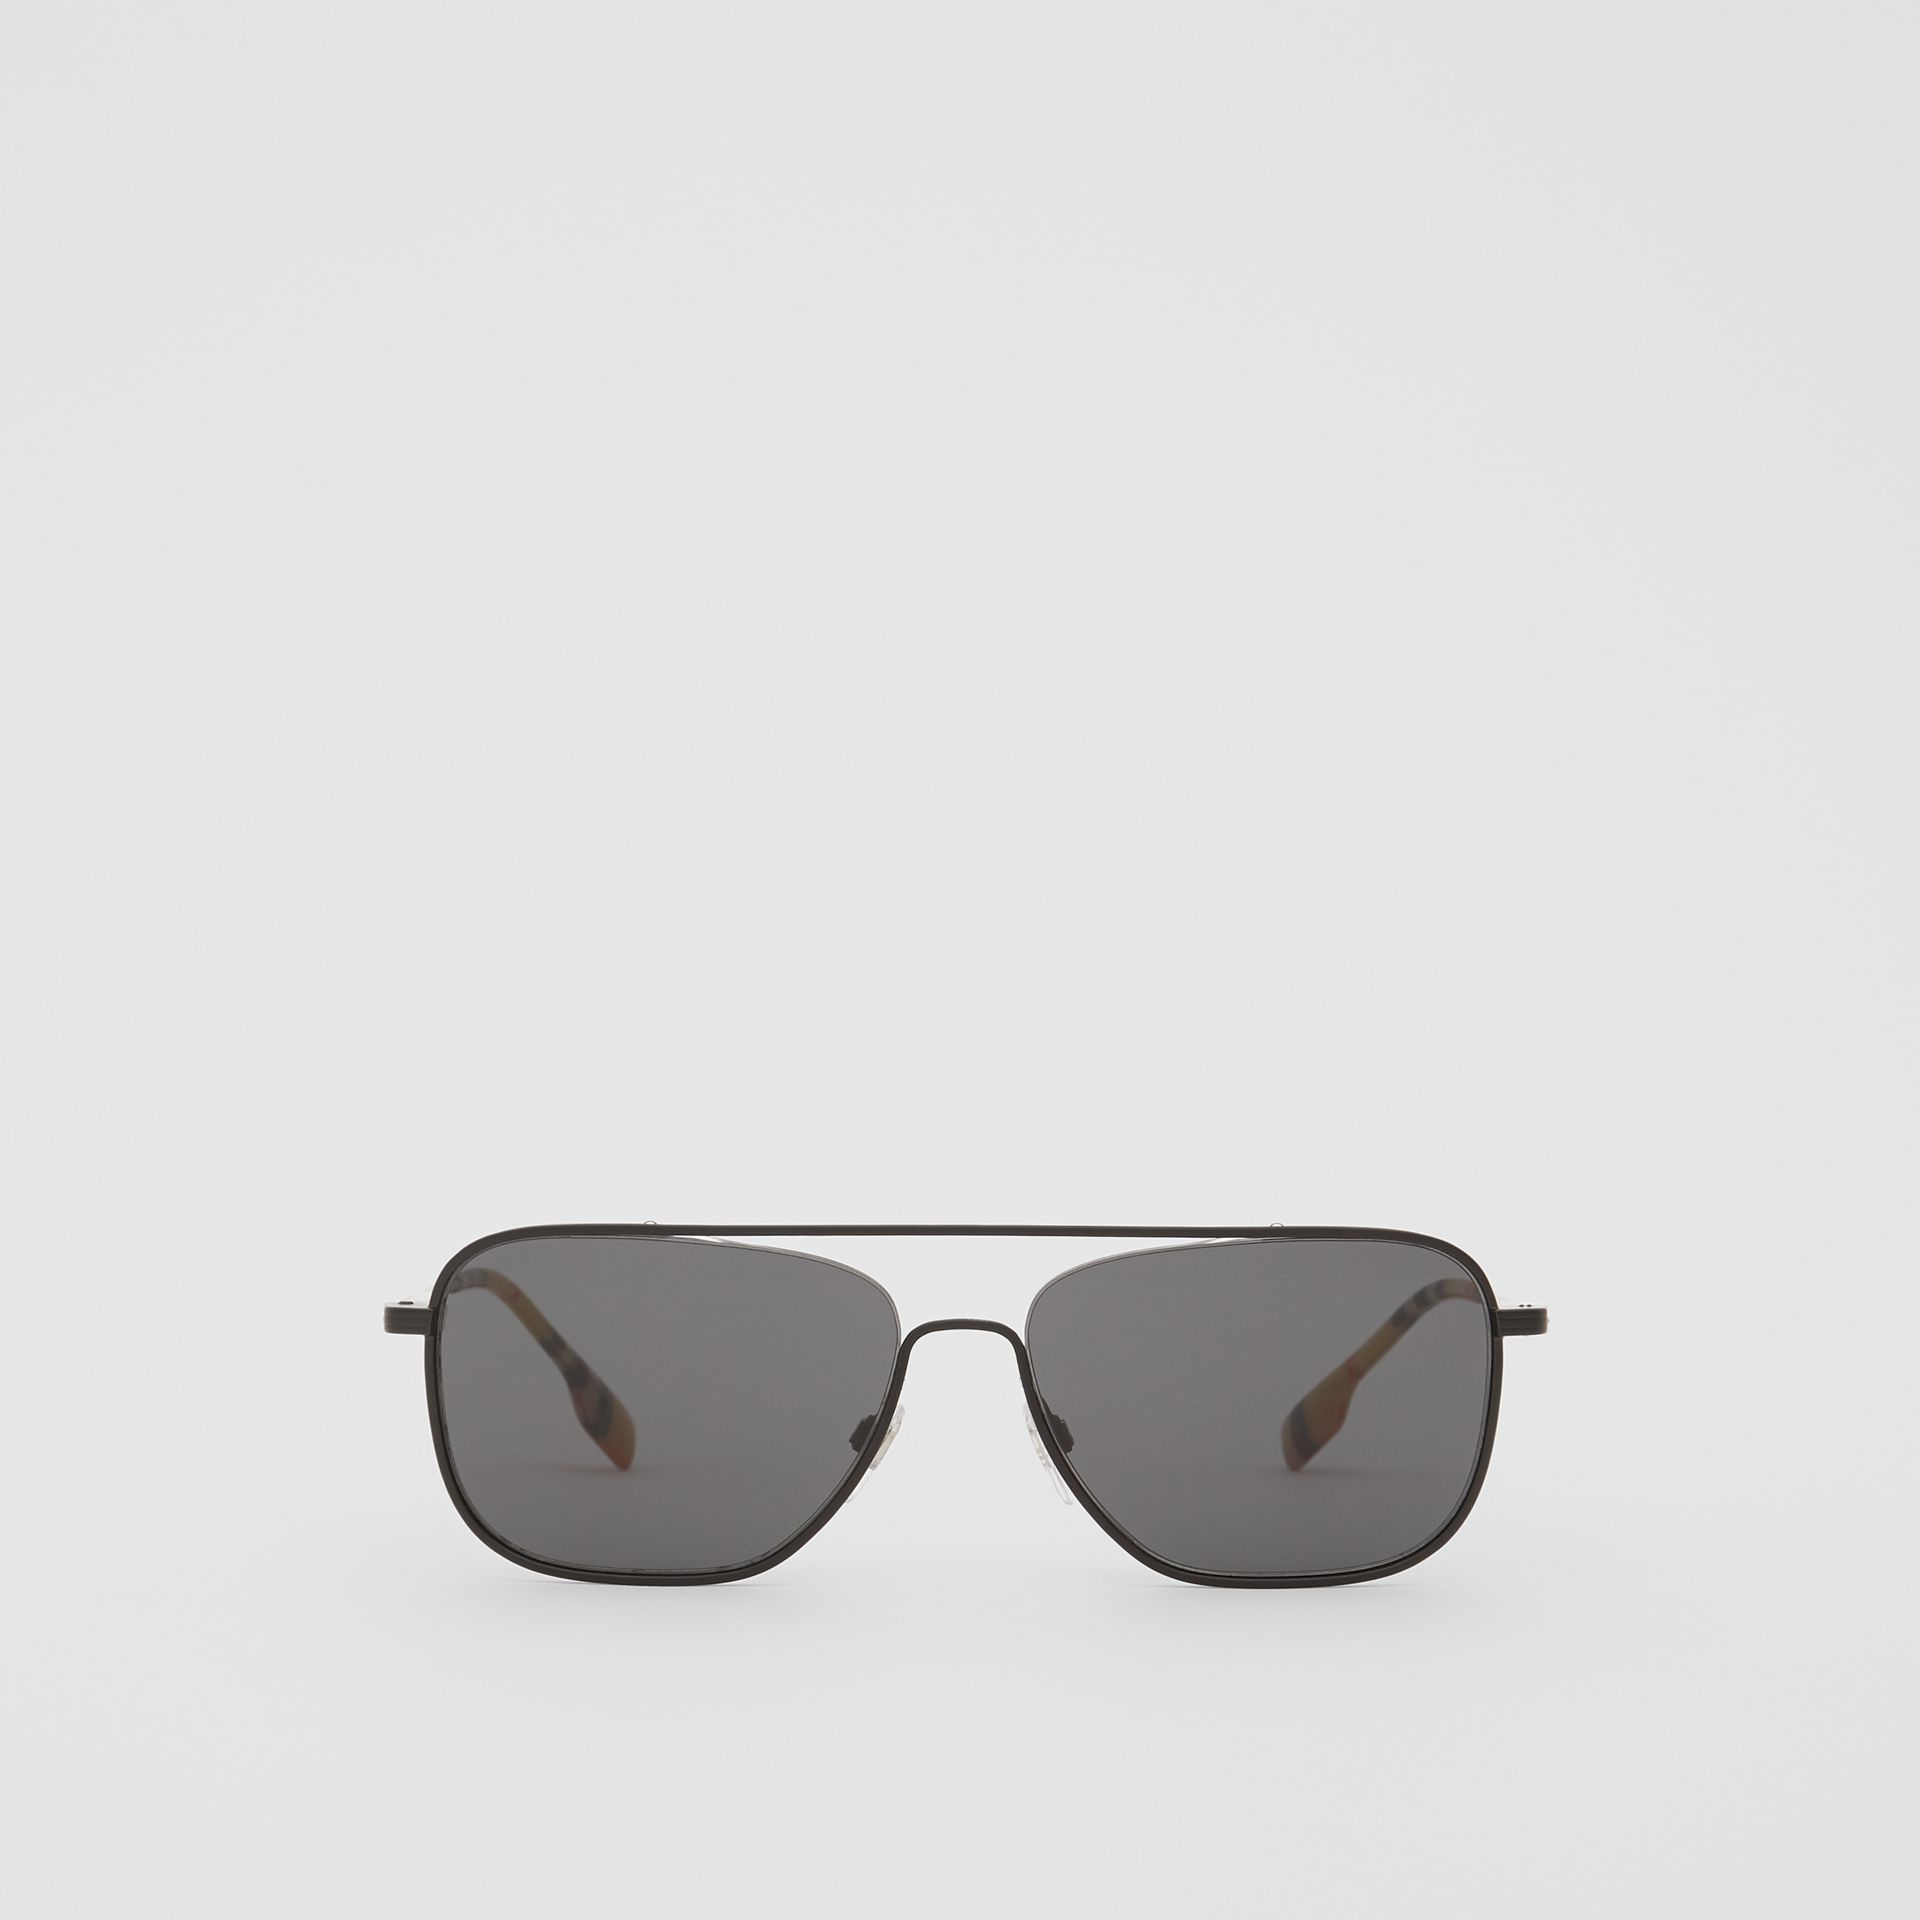 Top Bar Detail Square Frame Sunglasses in Matte Black - Men | Burberry Canada - gallery image 0